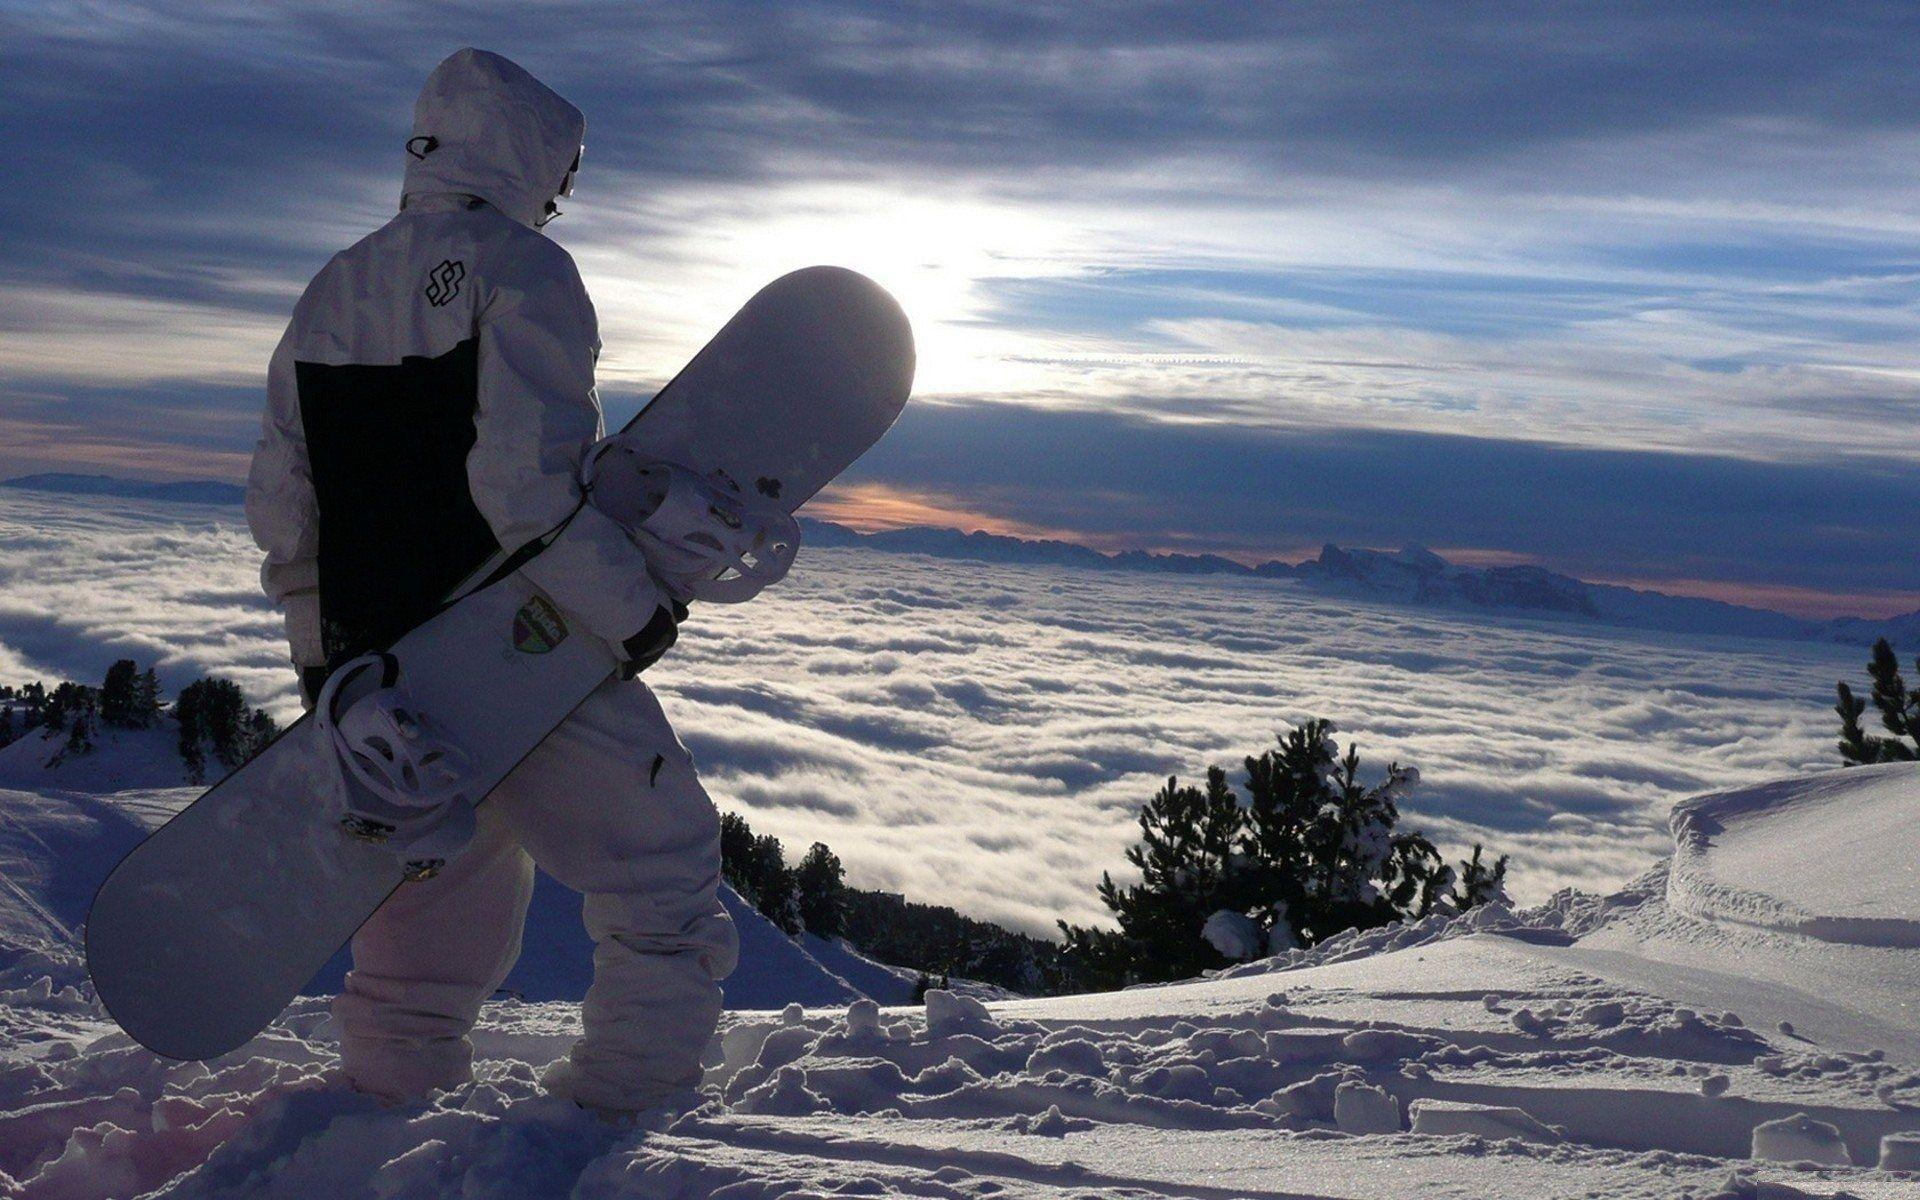 Snowboarding Wallpapers HD - Wallpaper - 343.4KB